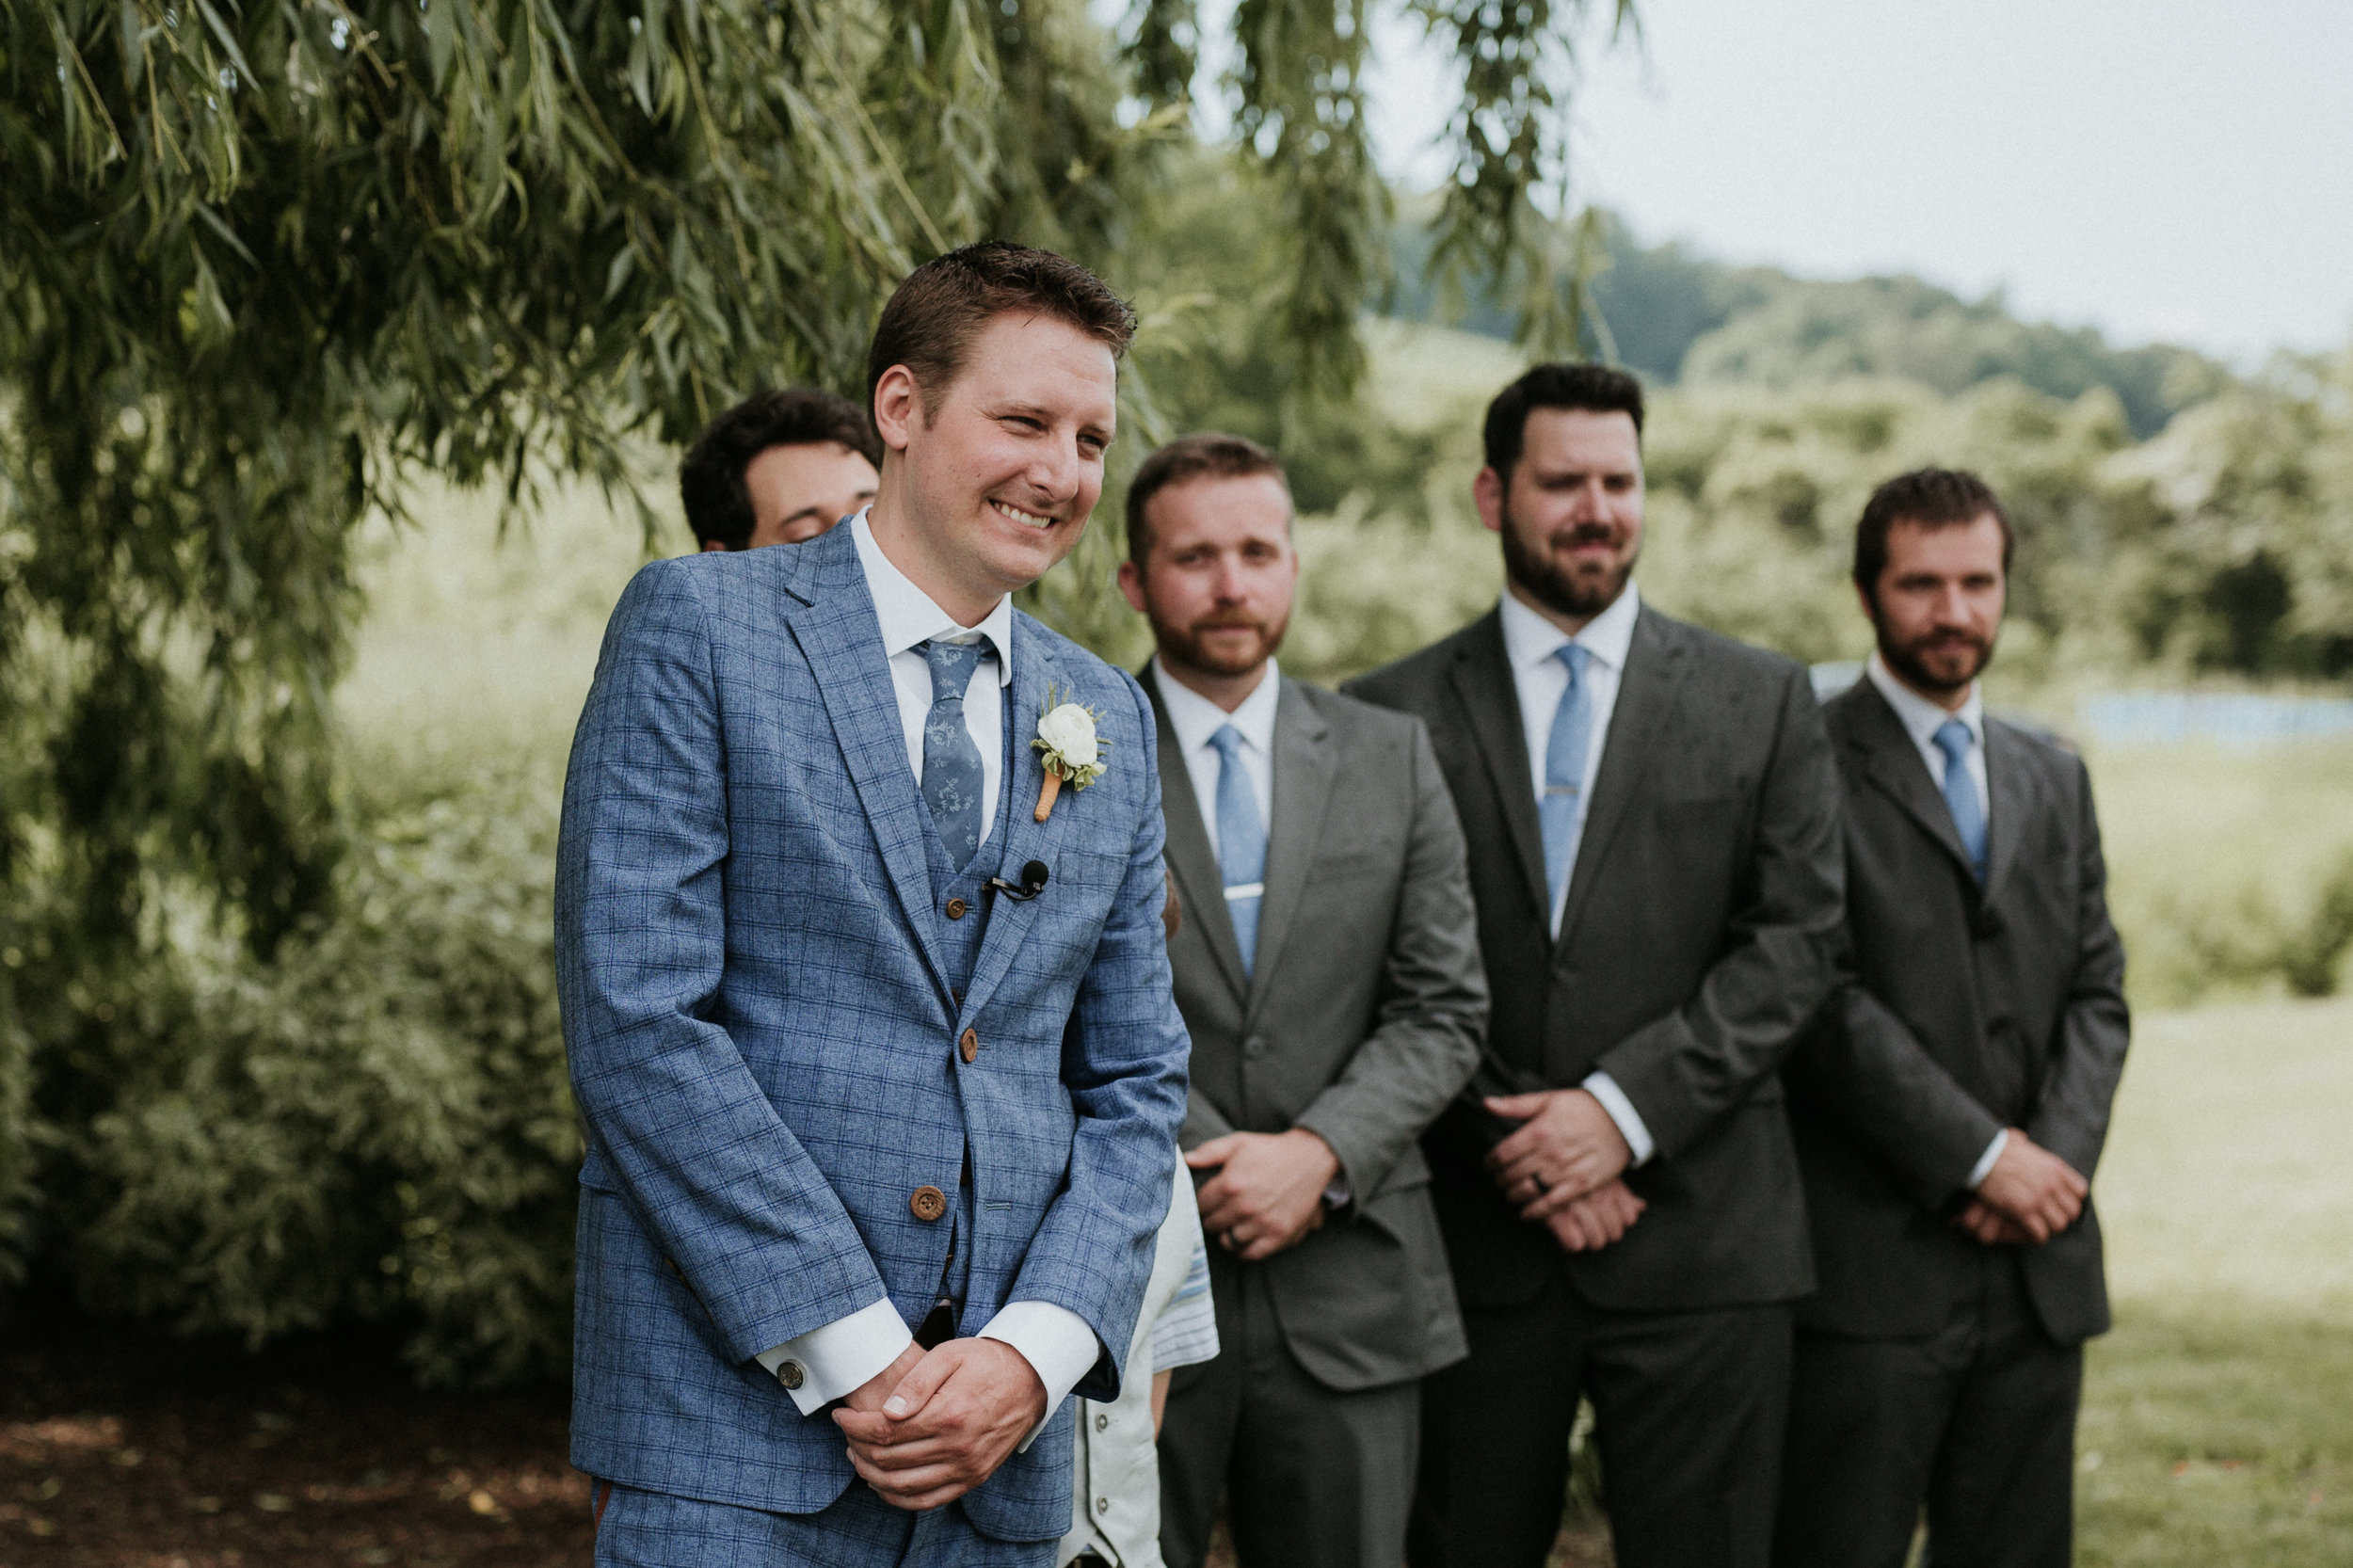 nostrano_vineyards_wedding_0044.JPG